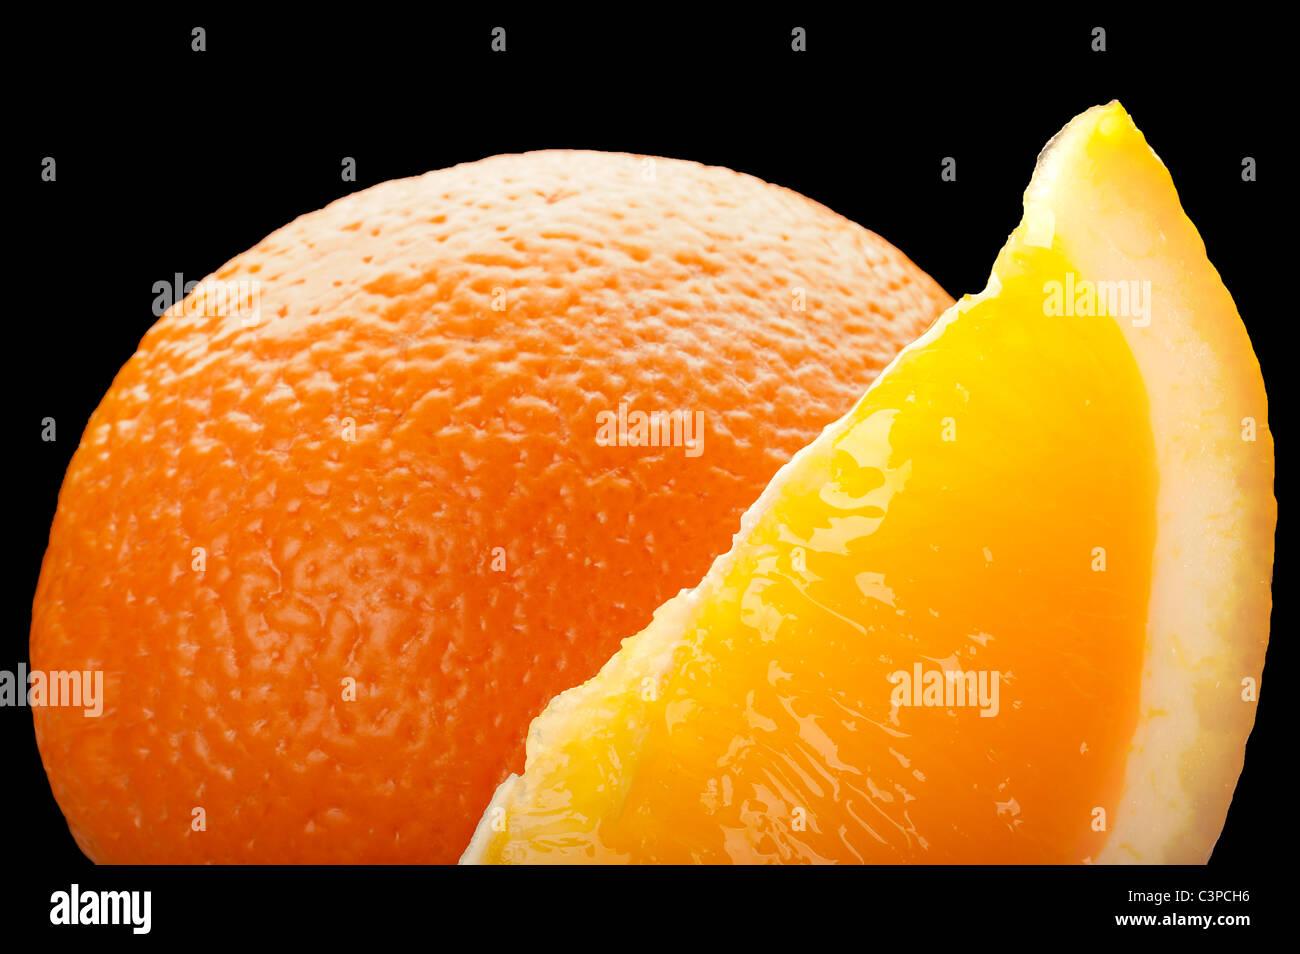 Fresh Oranges, Food - Stock Image